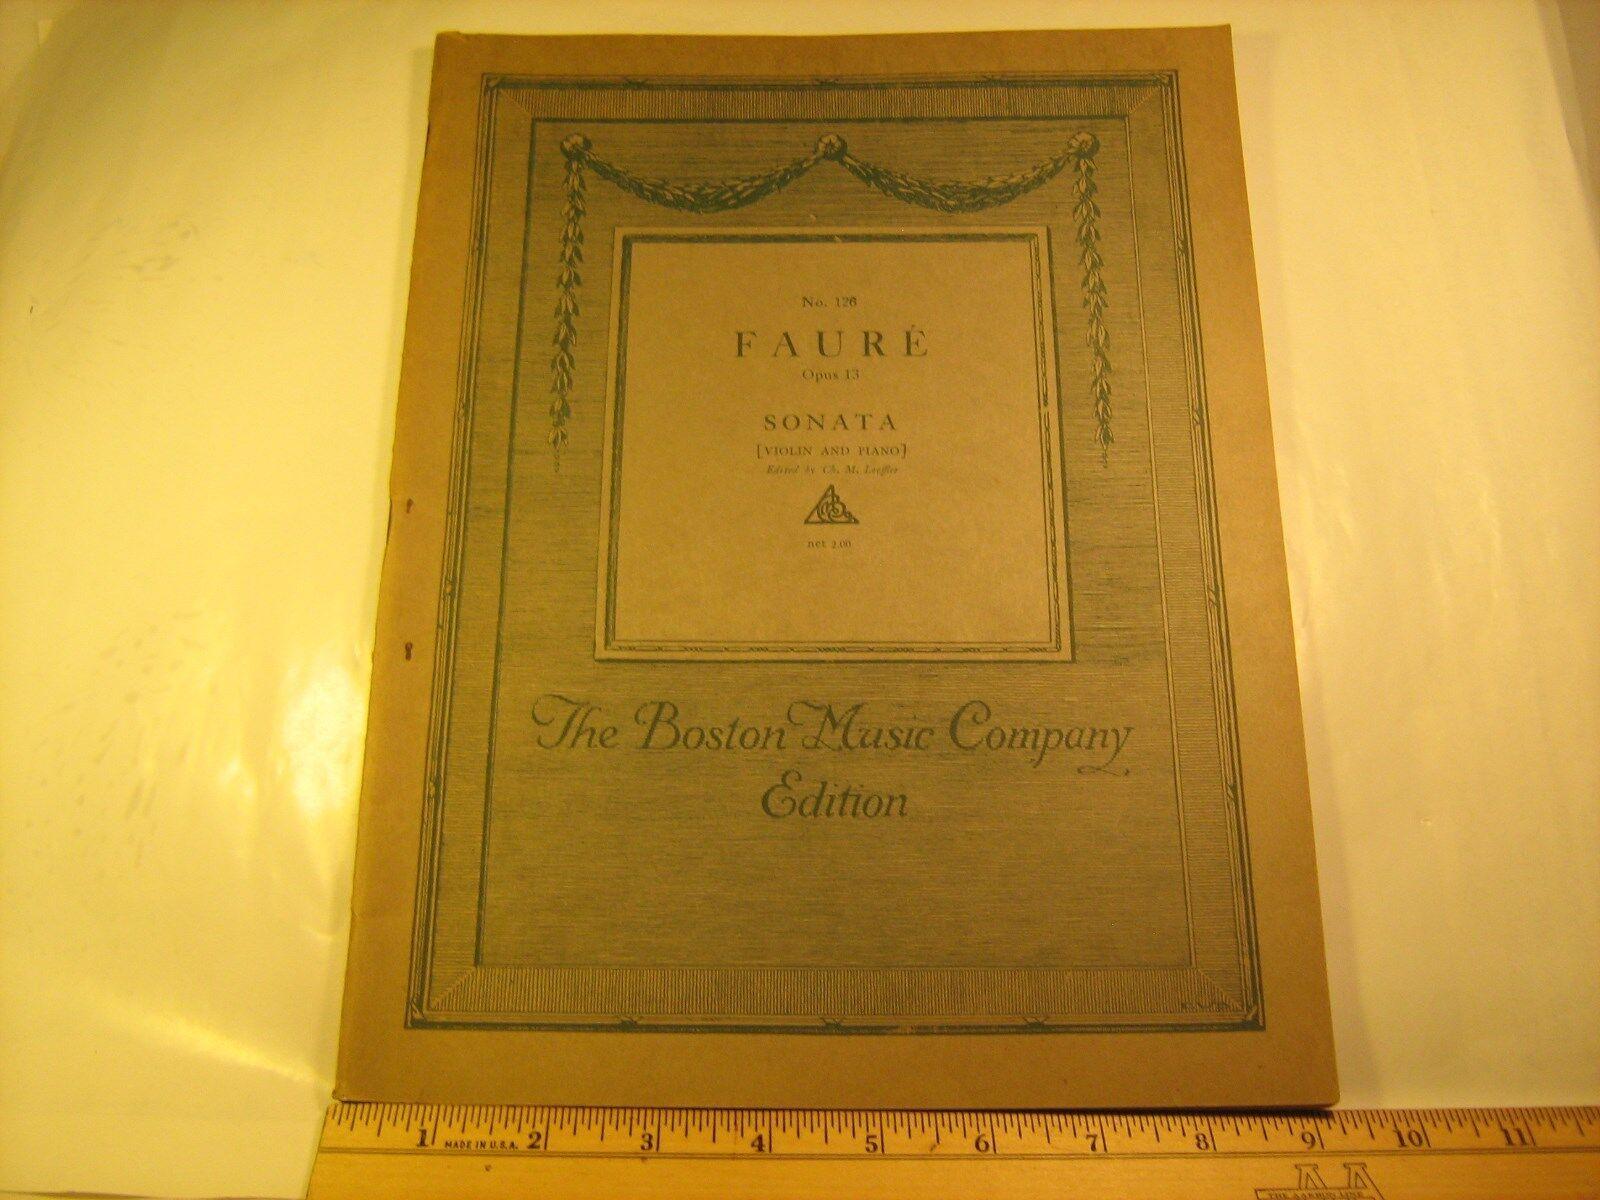 Vintage Sheet Music FAURE Opus 13 SONATA  126 Boston Music Co 1919